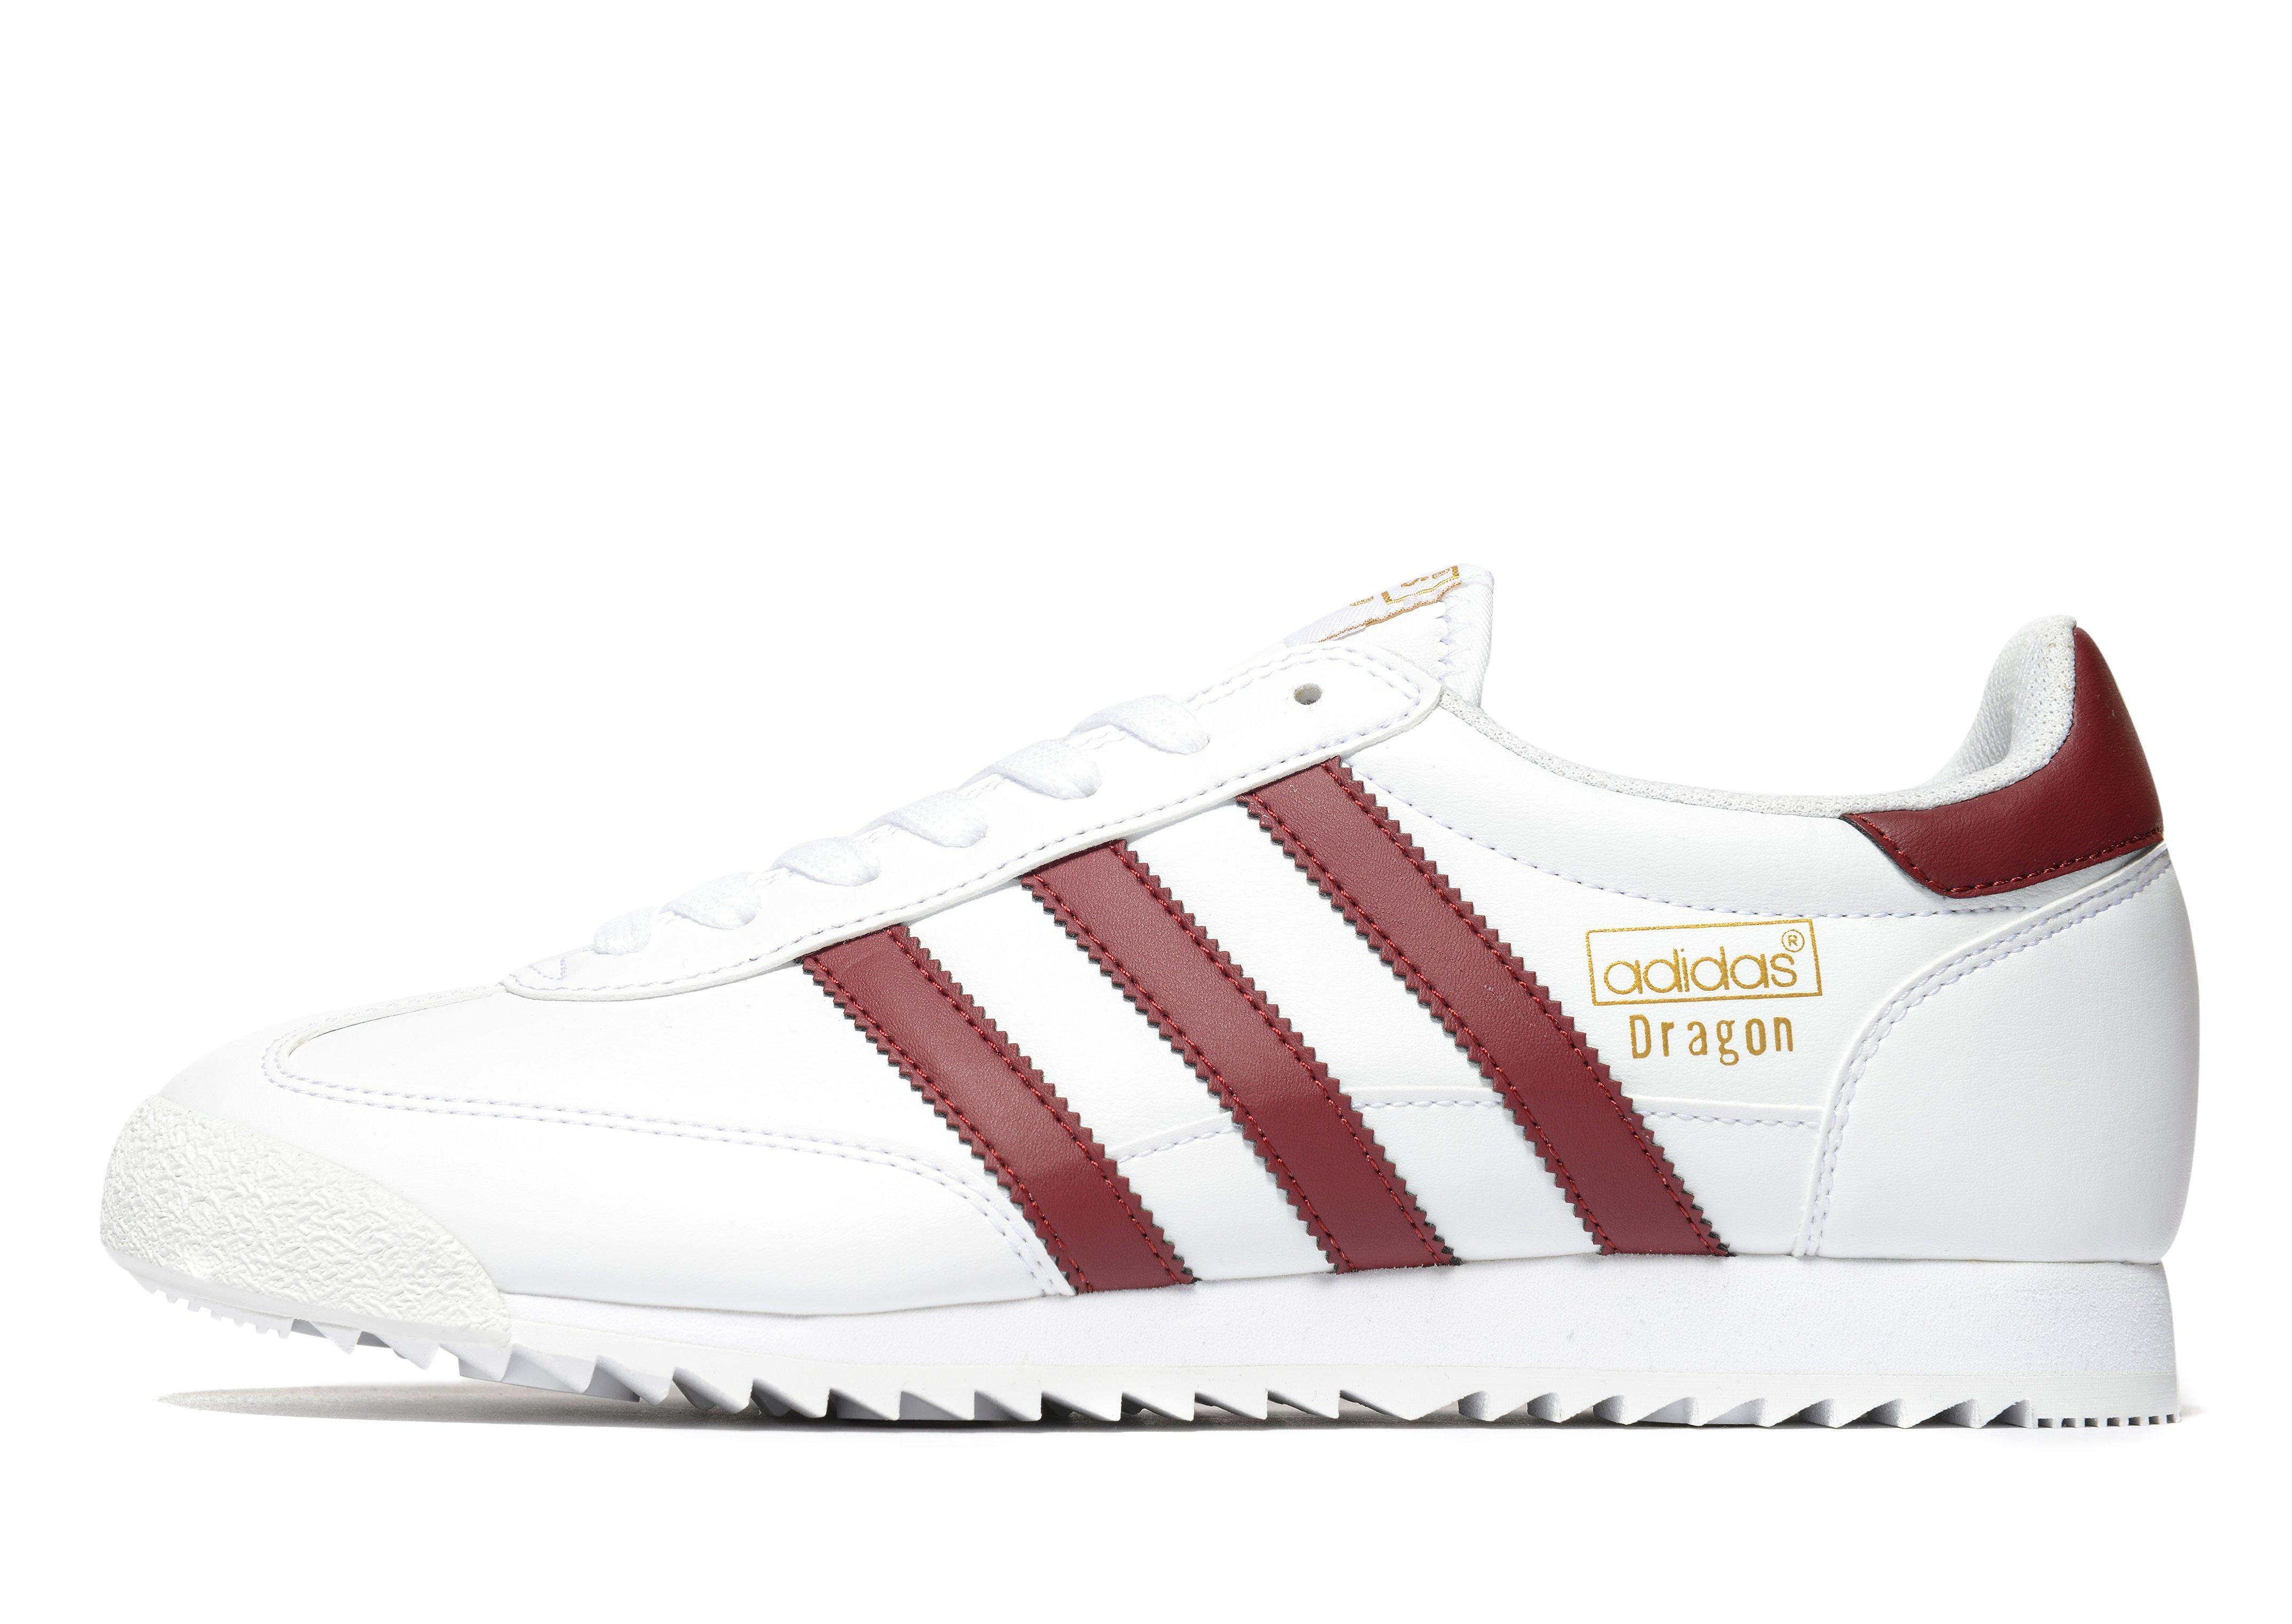 Adidas Activewear Shoes